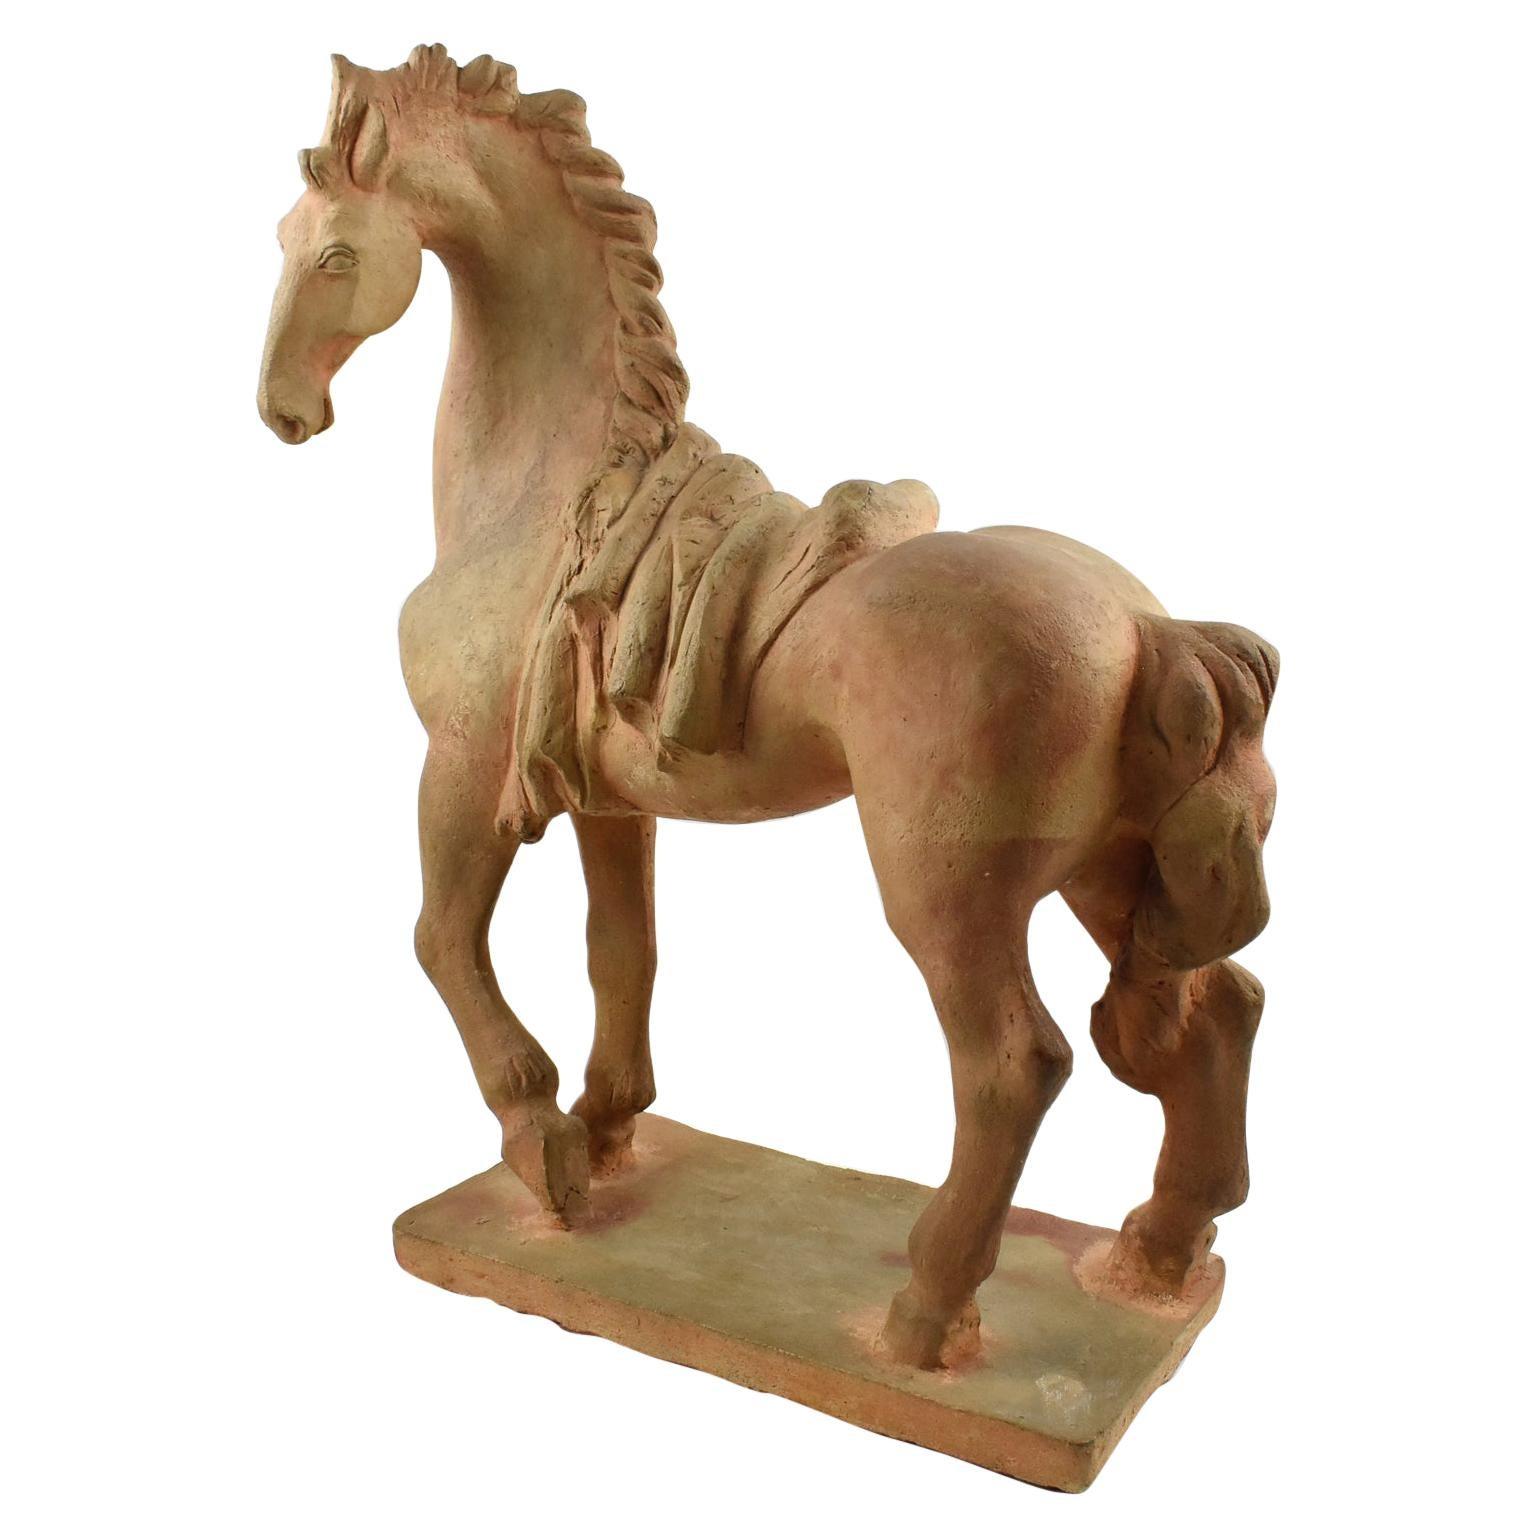 1940s Terracotta Horse Sculpture by French J. de Monpesat